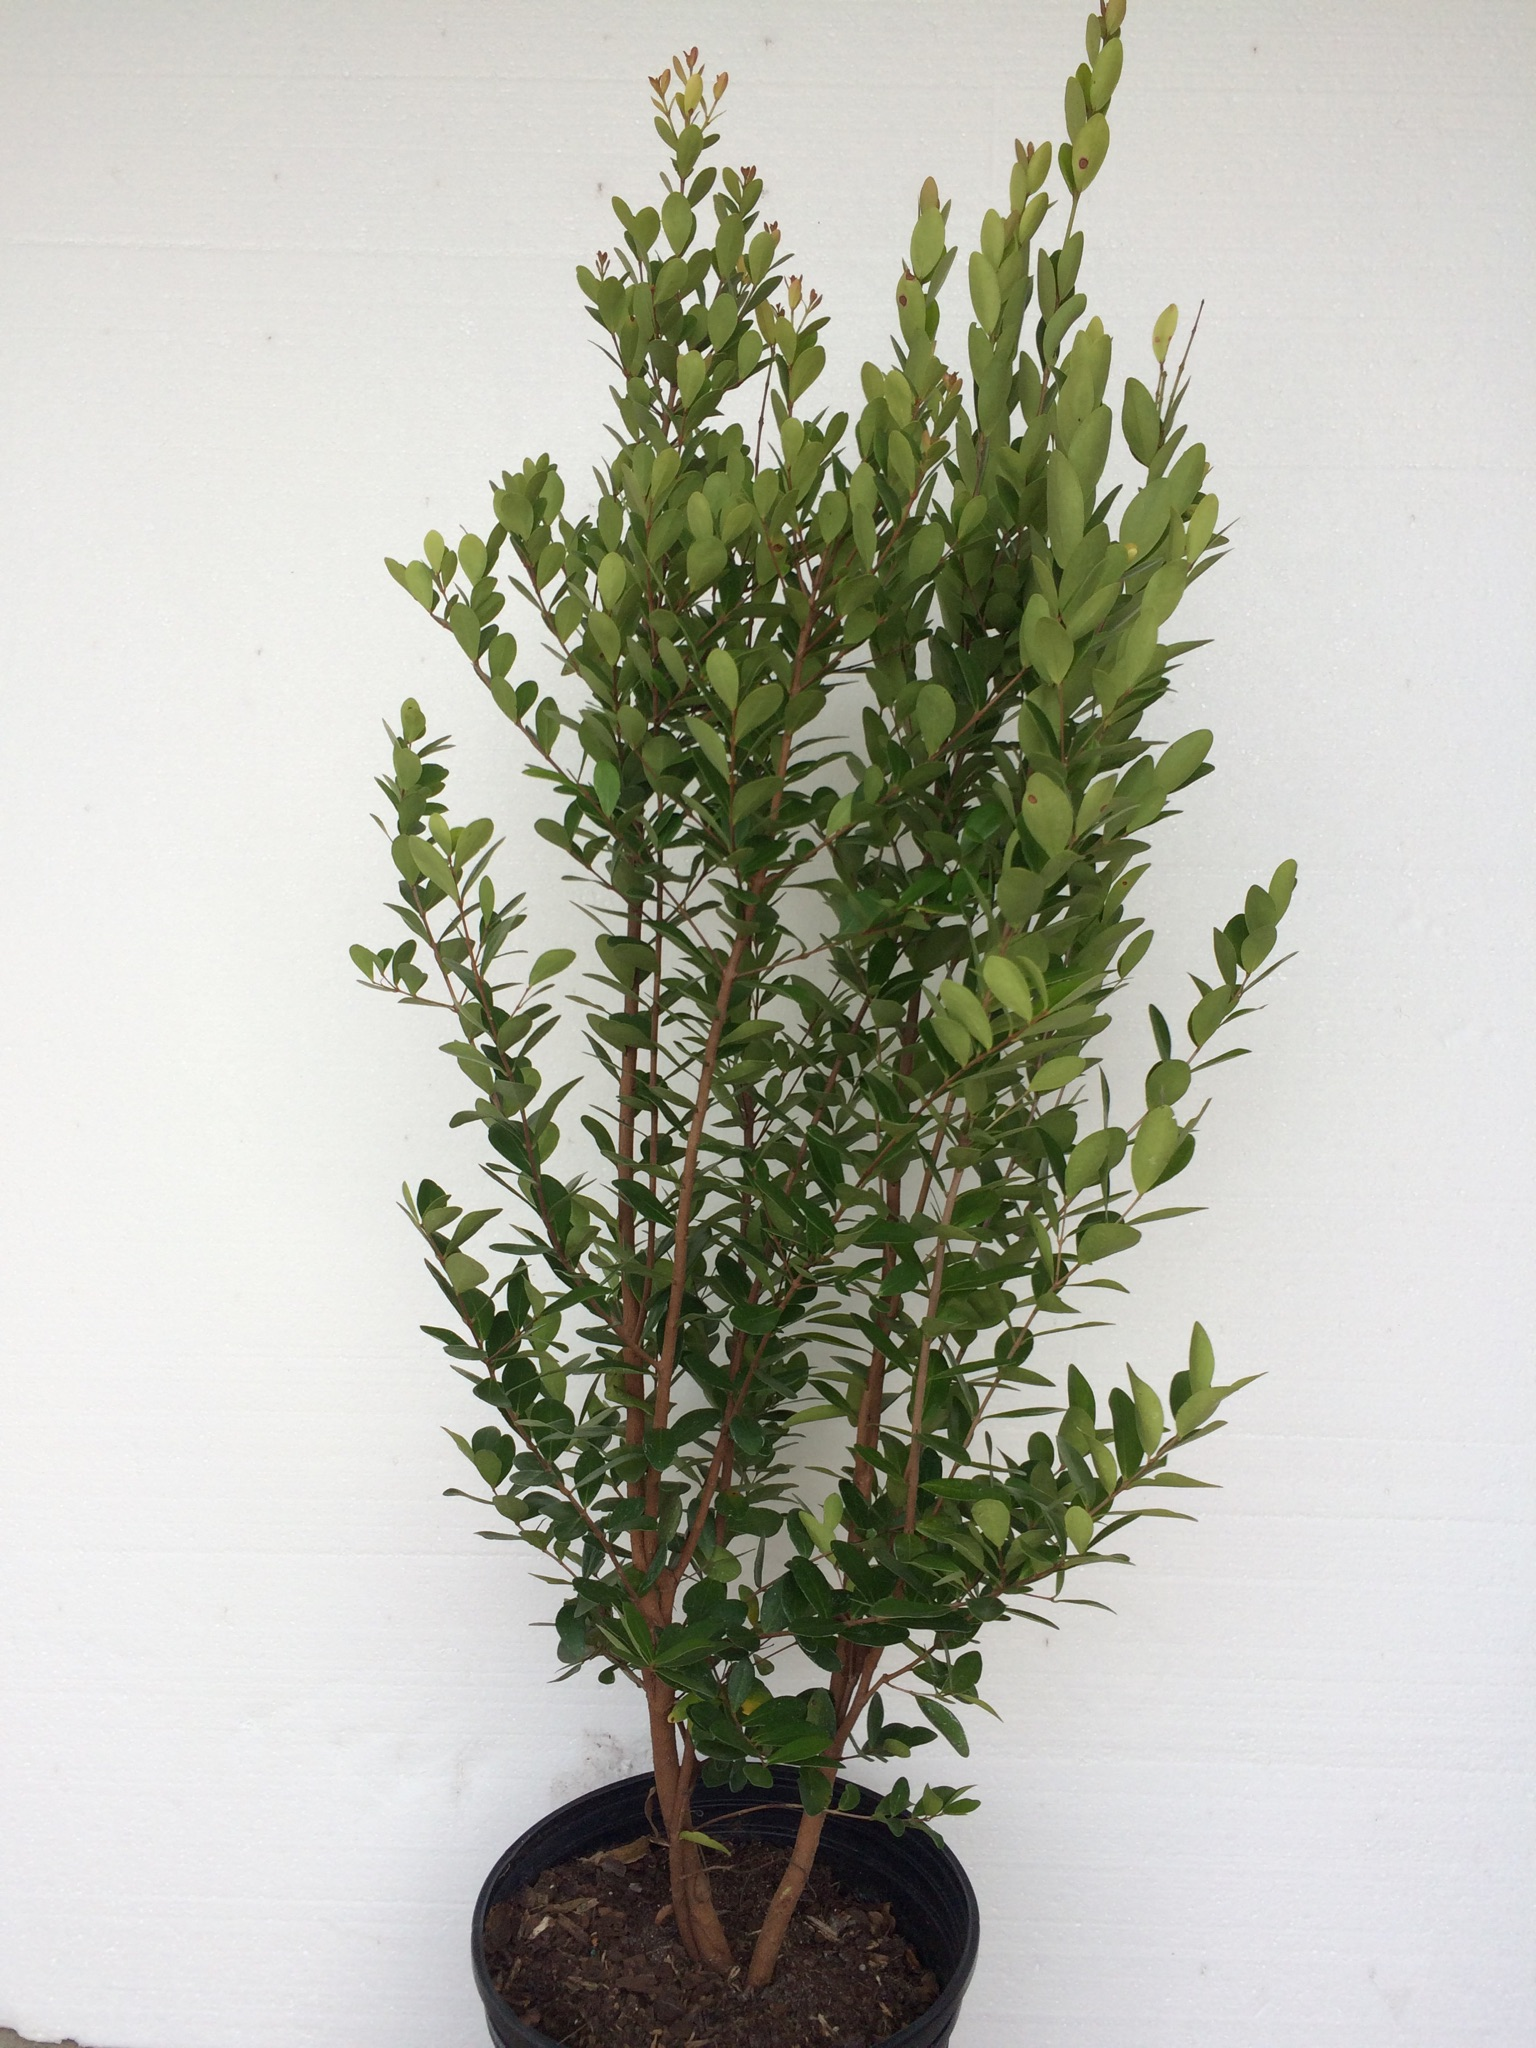 Spanish Stopper For Sale Green Seasons Wholesale Nursery